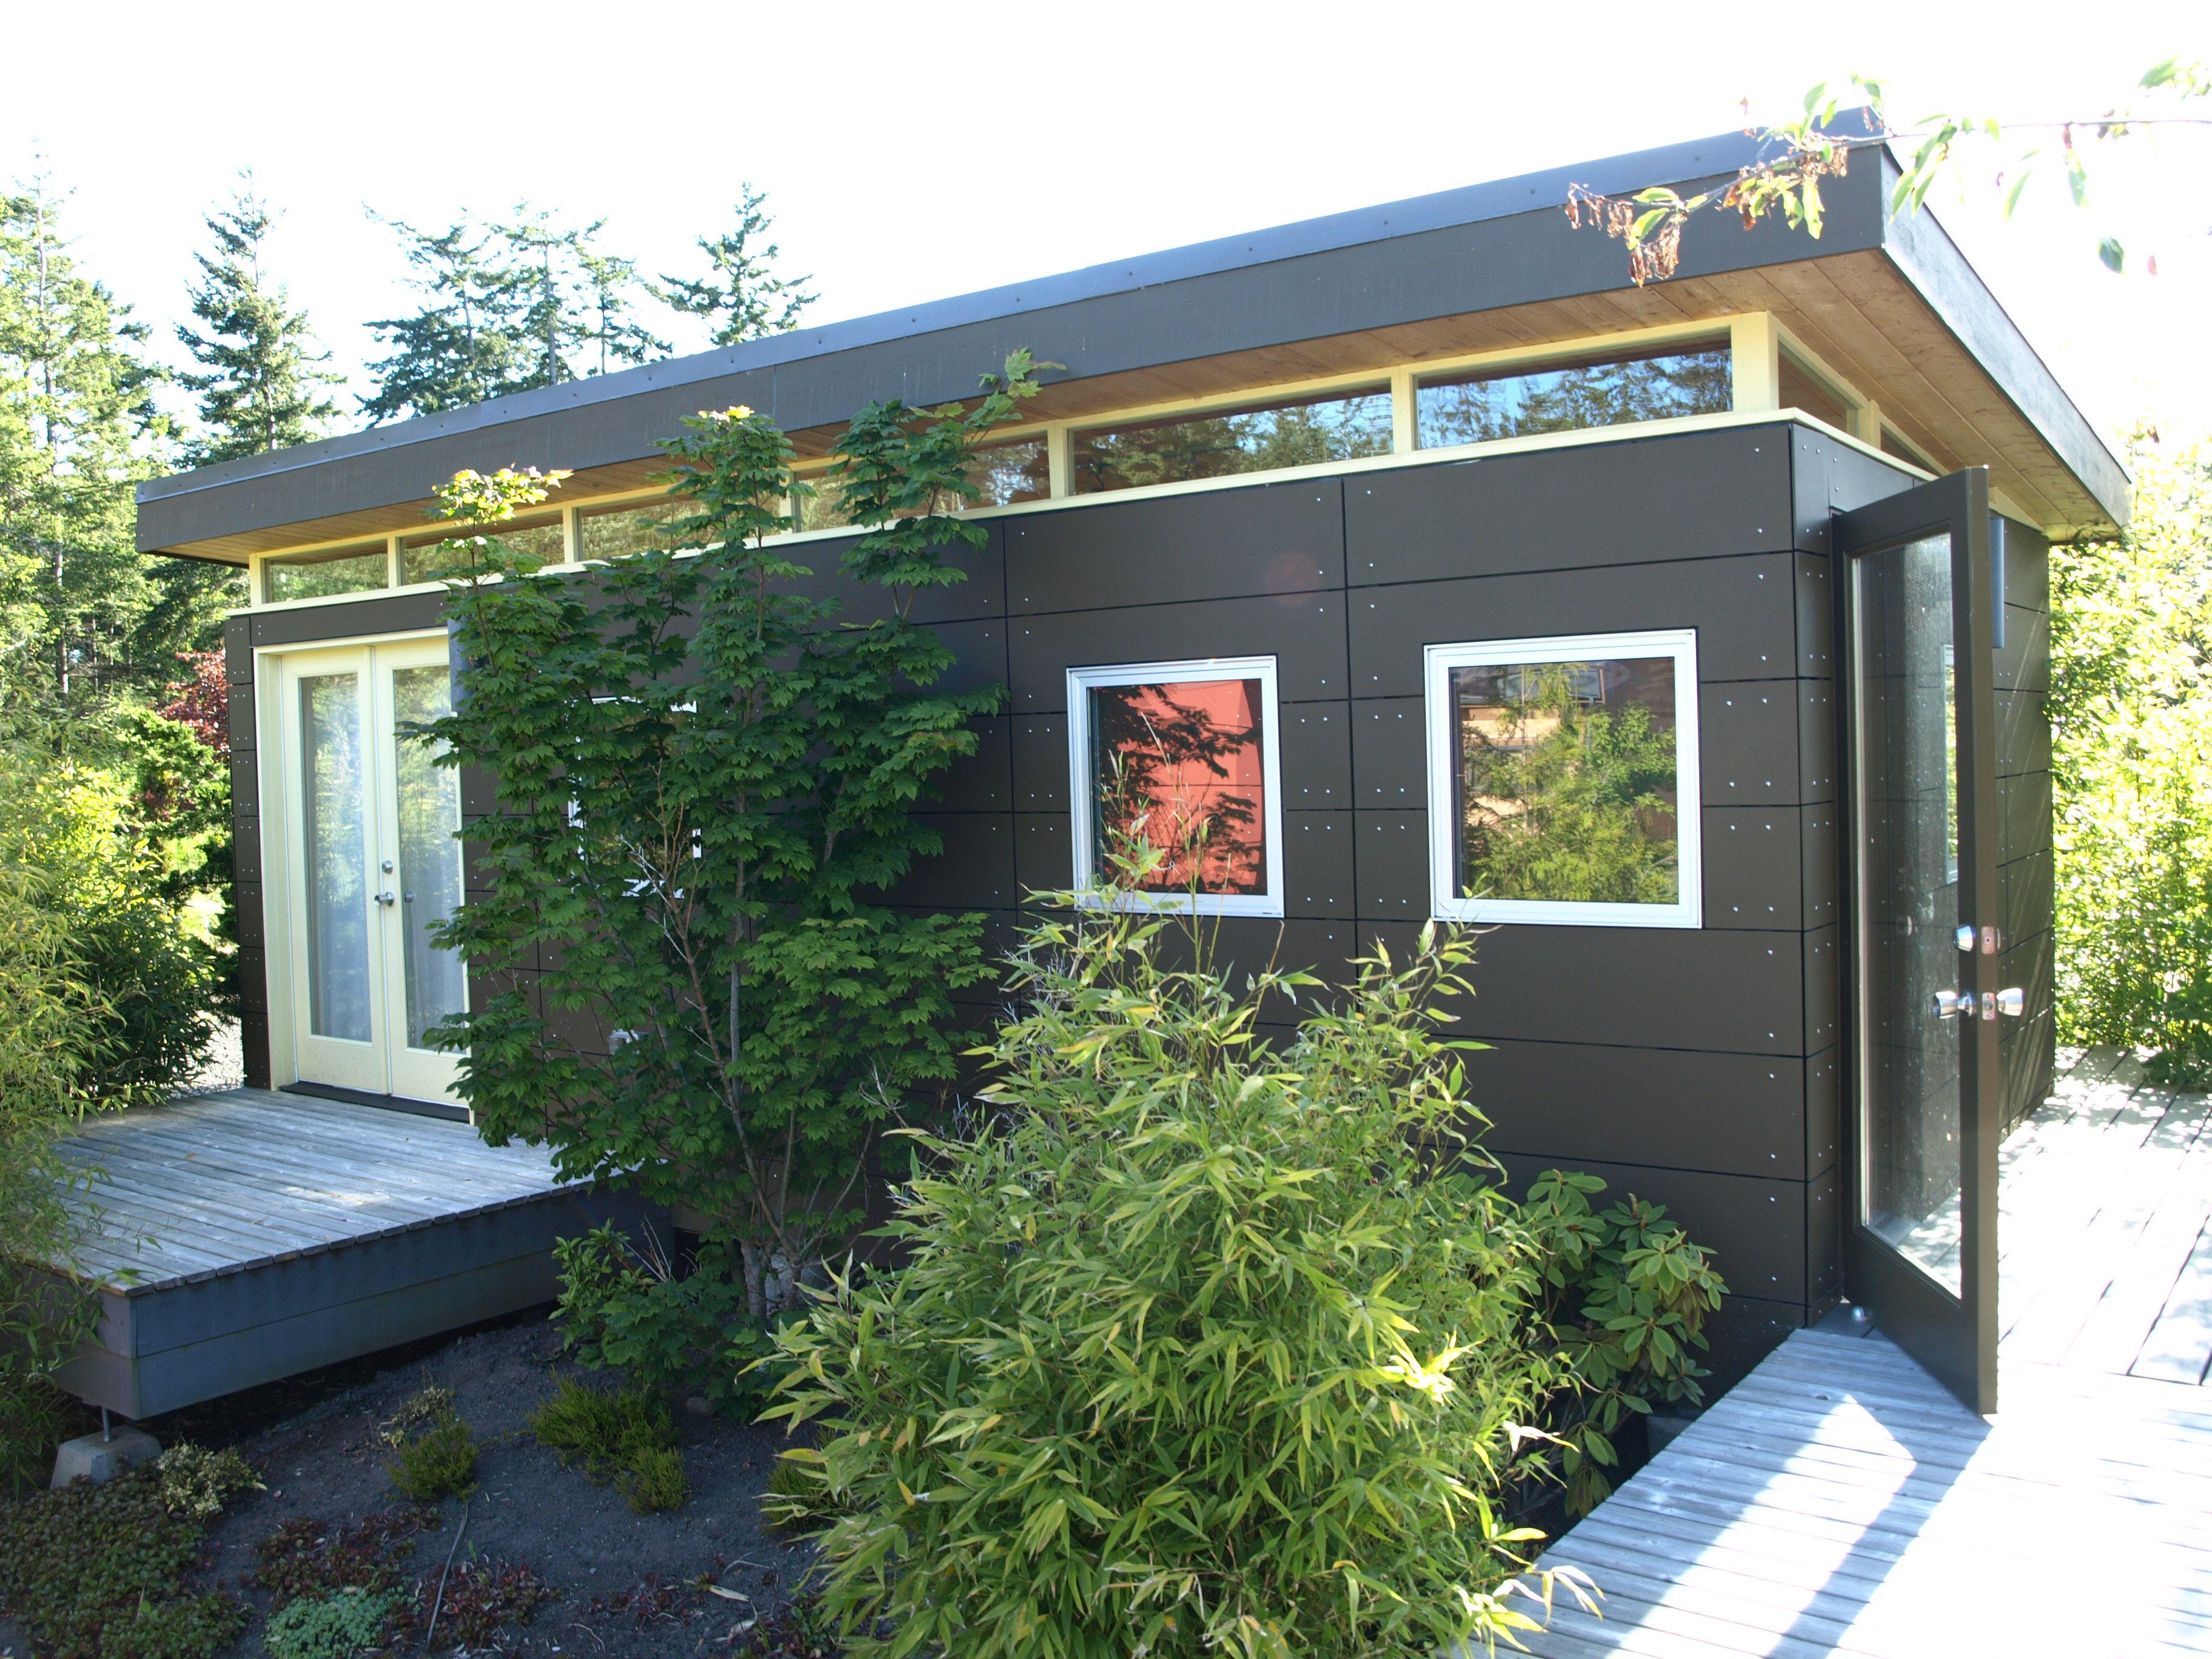 Mur Modern Prefab Homes Modular Homes Prefabricated Backyard Cottage In Law Suite Modern Prefab Homes